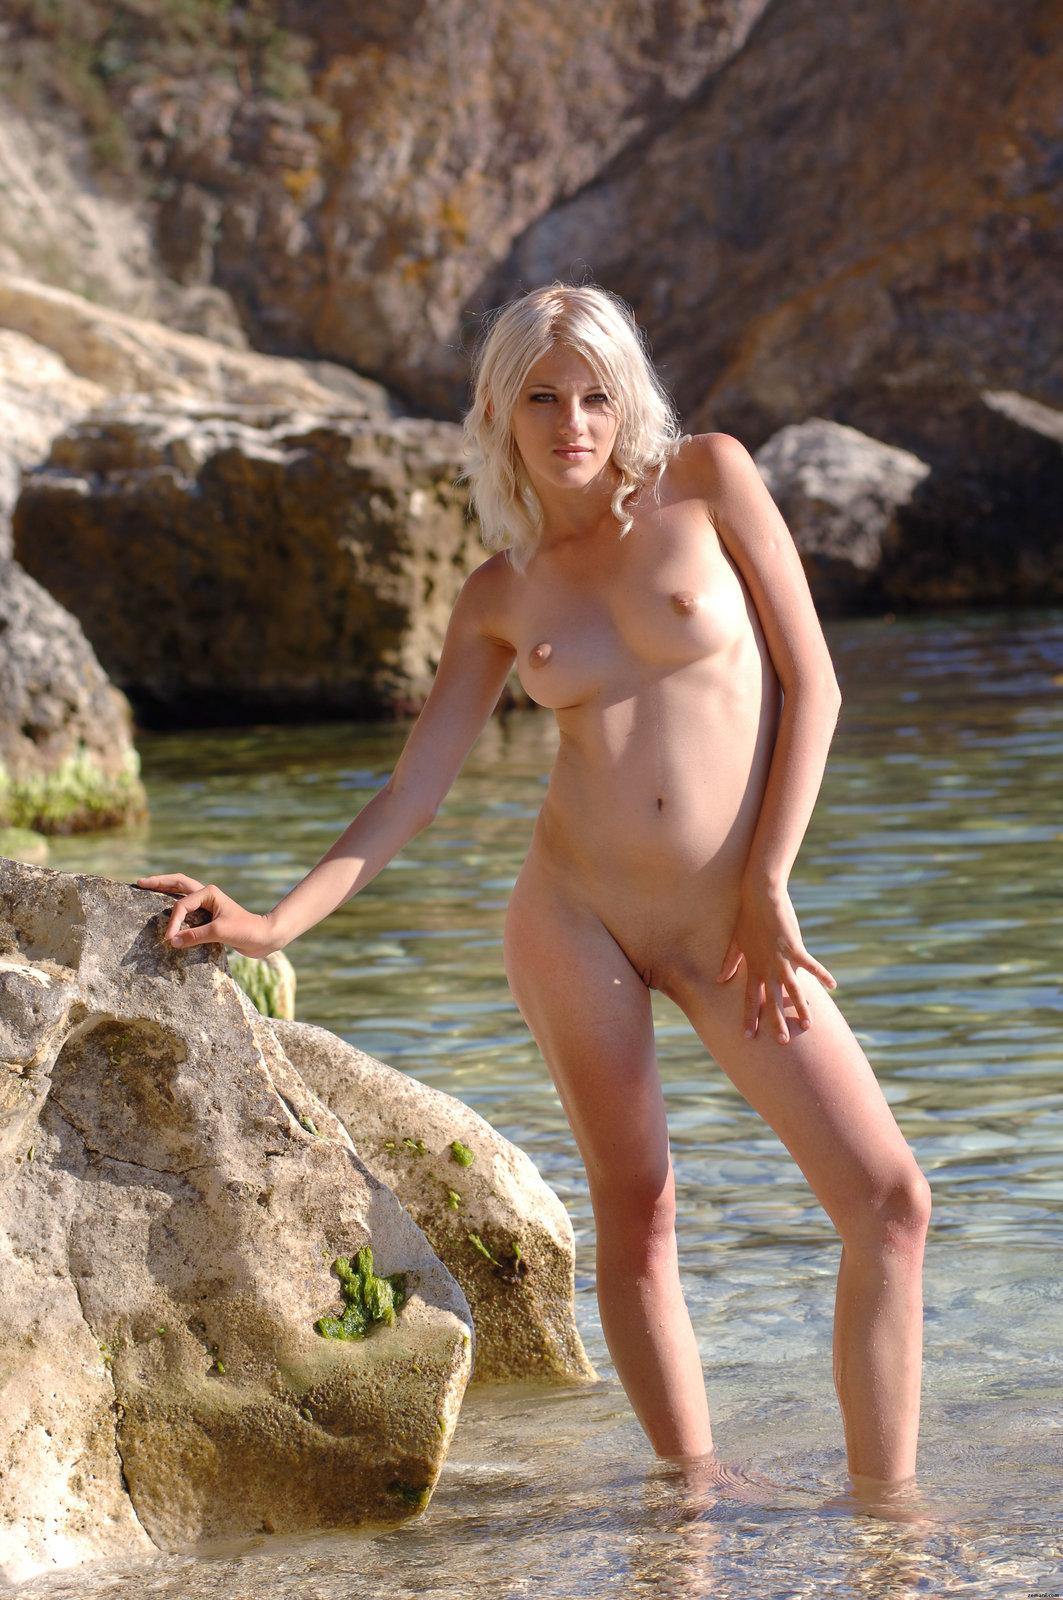 12 18 - Super blondi nad oceanem